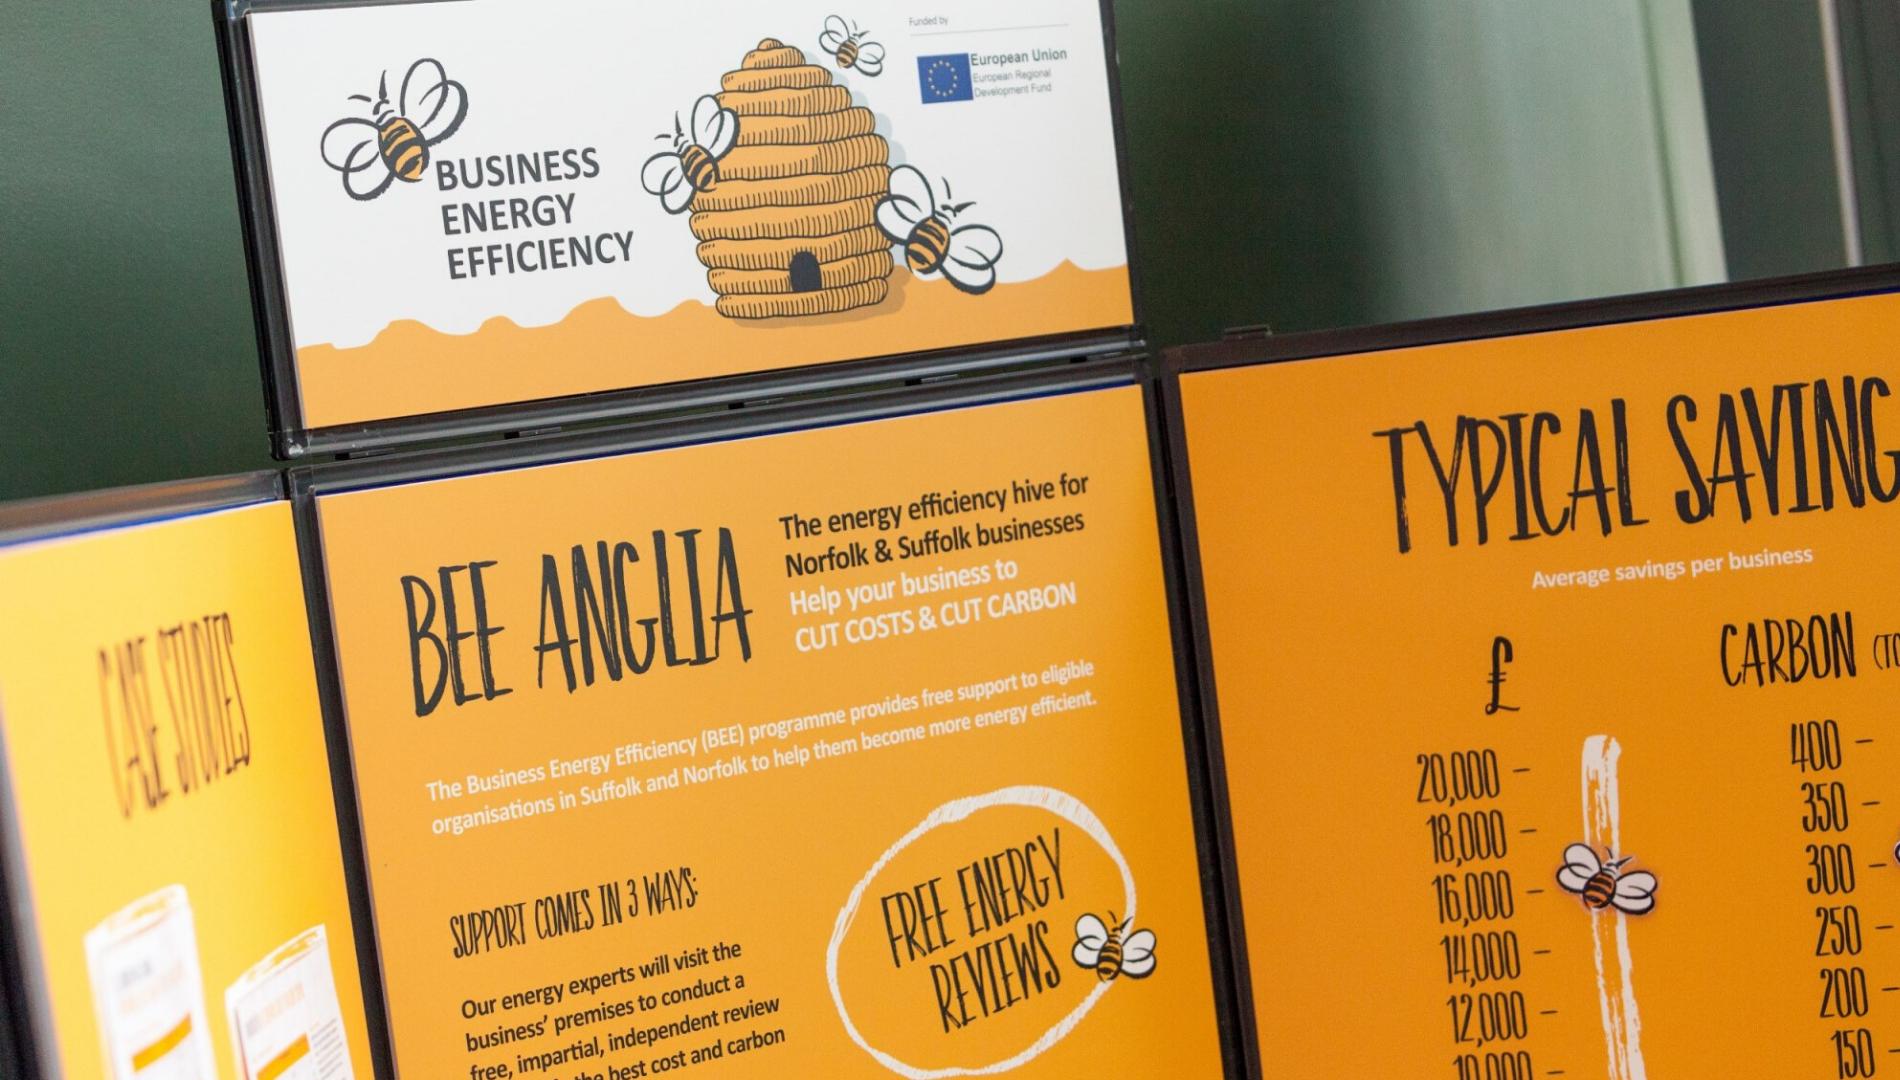 Business Energy Efficiency